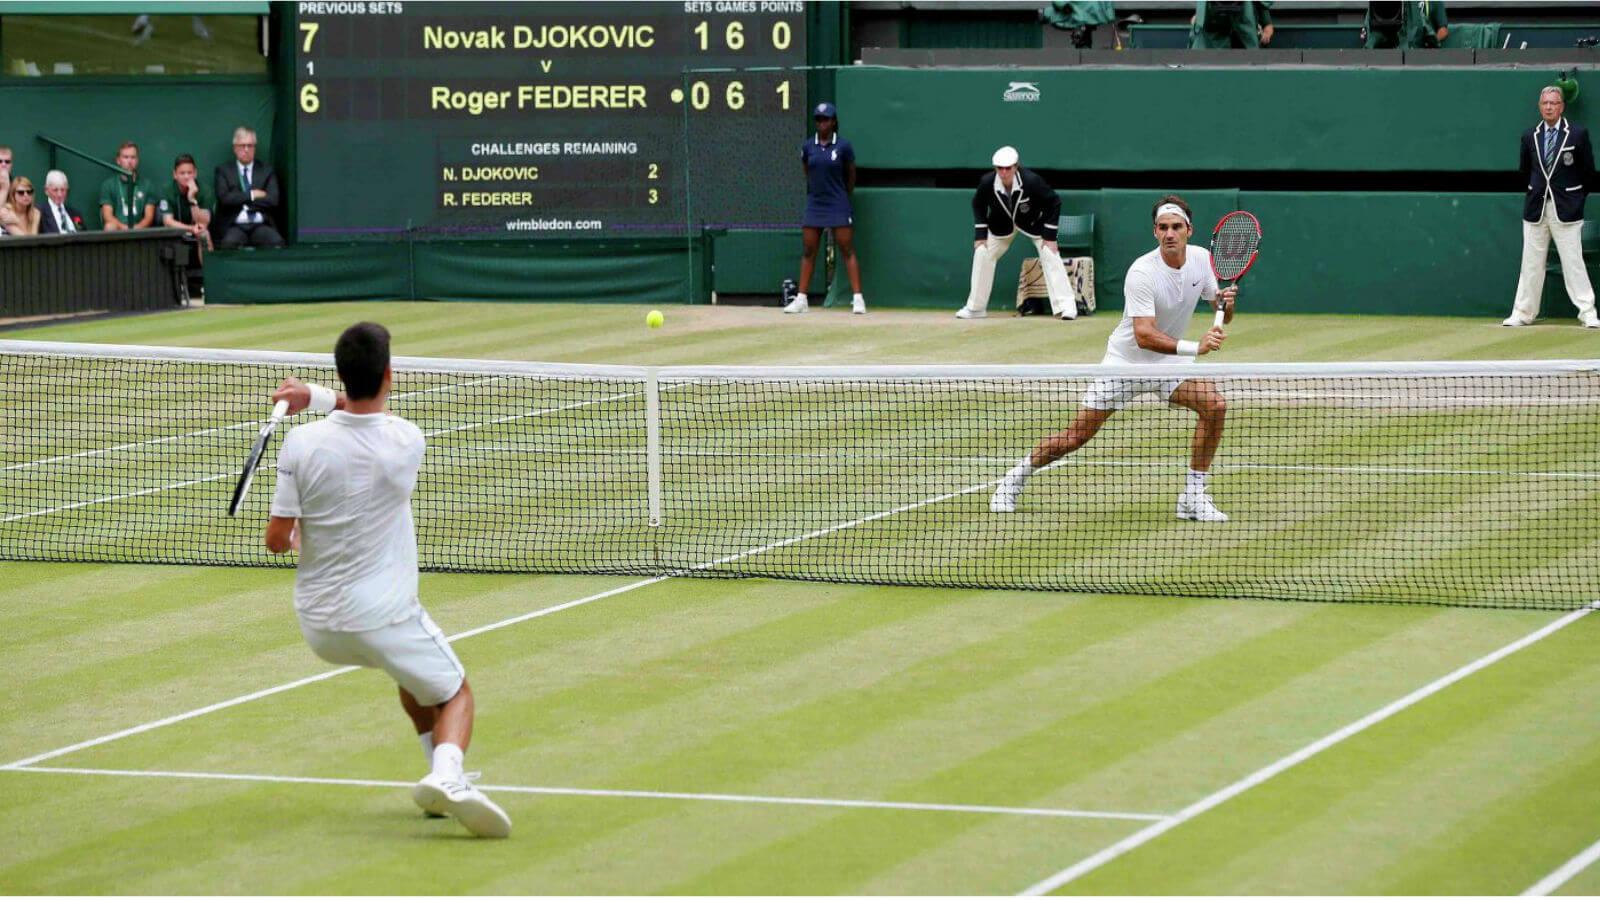 Ставки на геймы в теннисе лайв стратегии gogobet